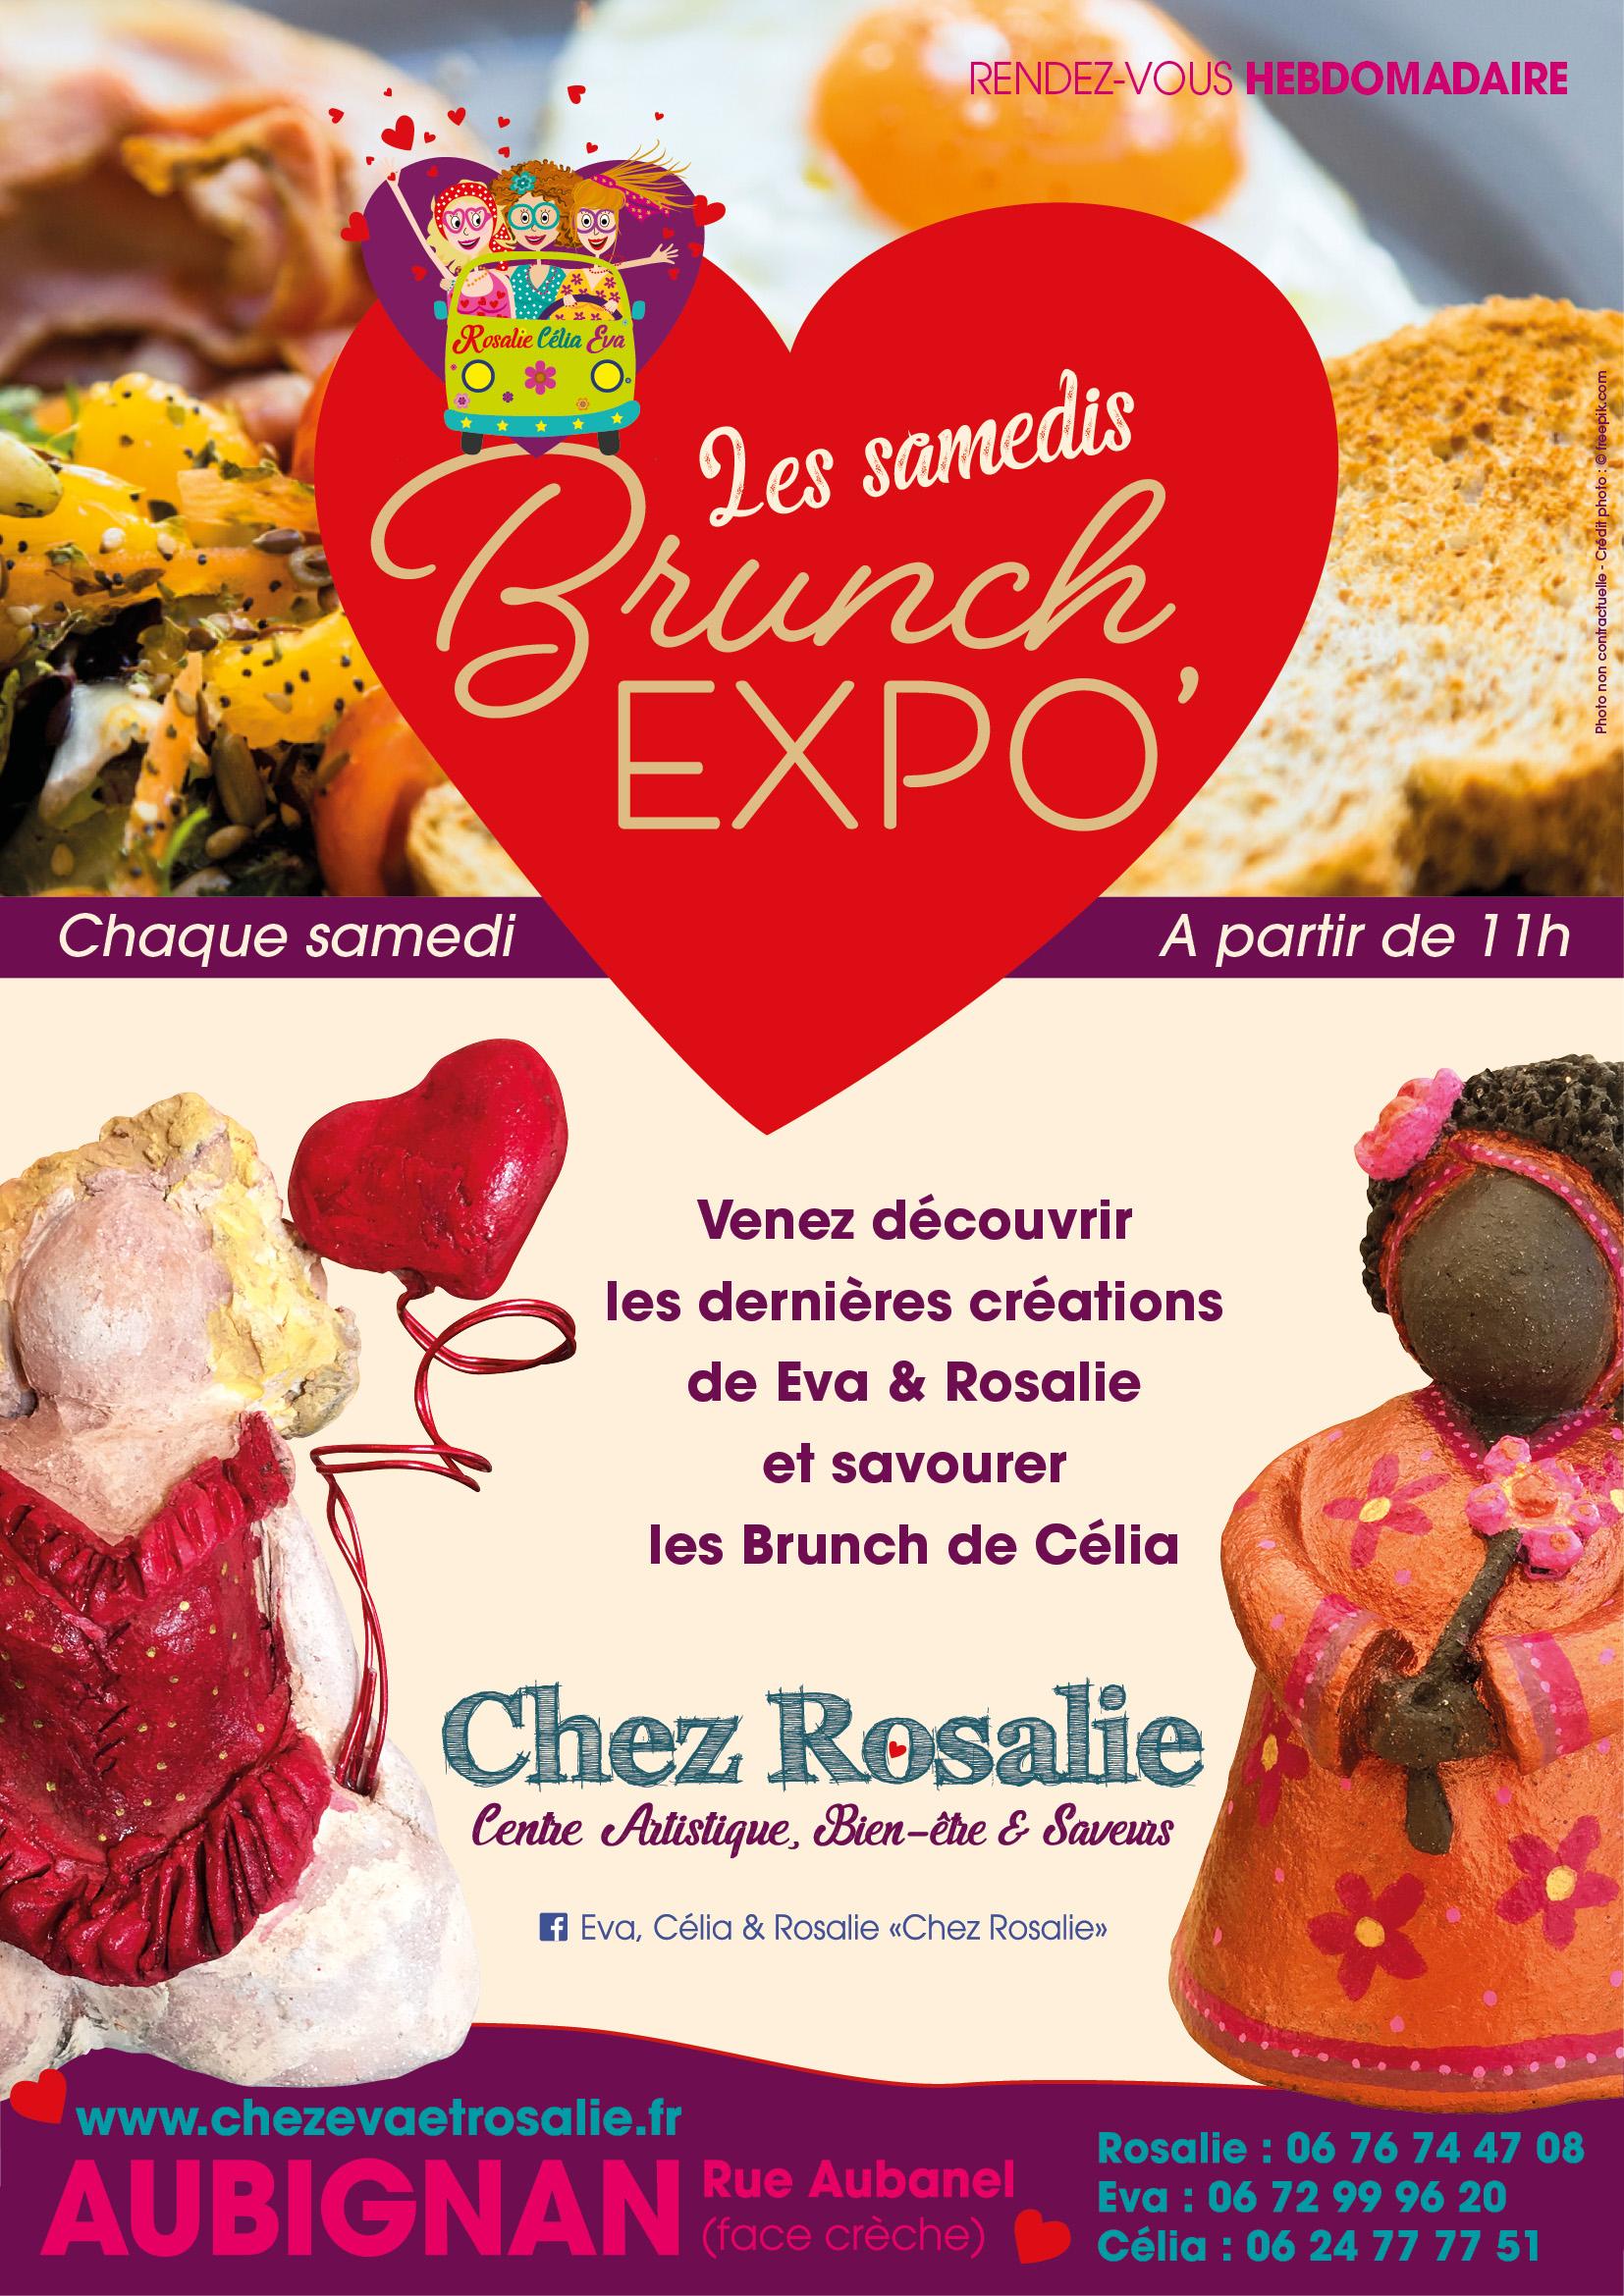 Les Brunch Expo' du samedi